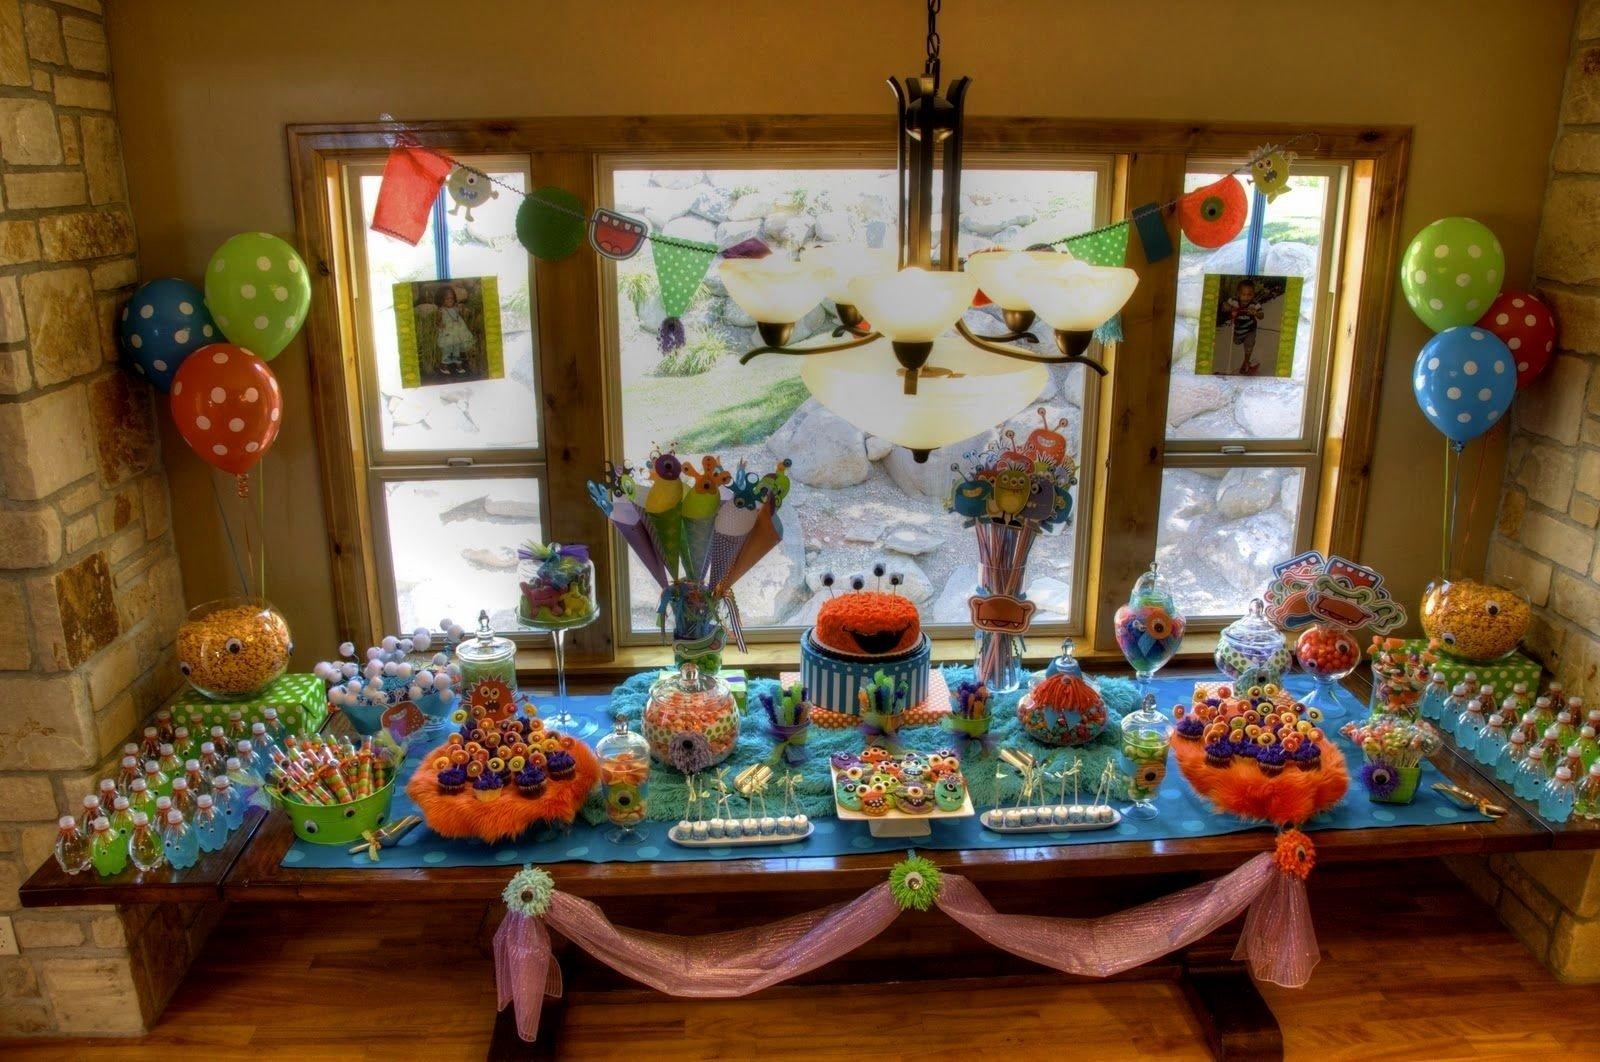 10 Trendy 4 Year Old Birthday Ideas themes birthday a 2 year old birthday party ideas with 2 year old 10 2020